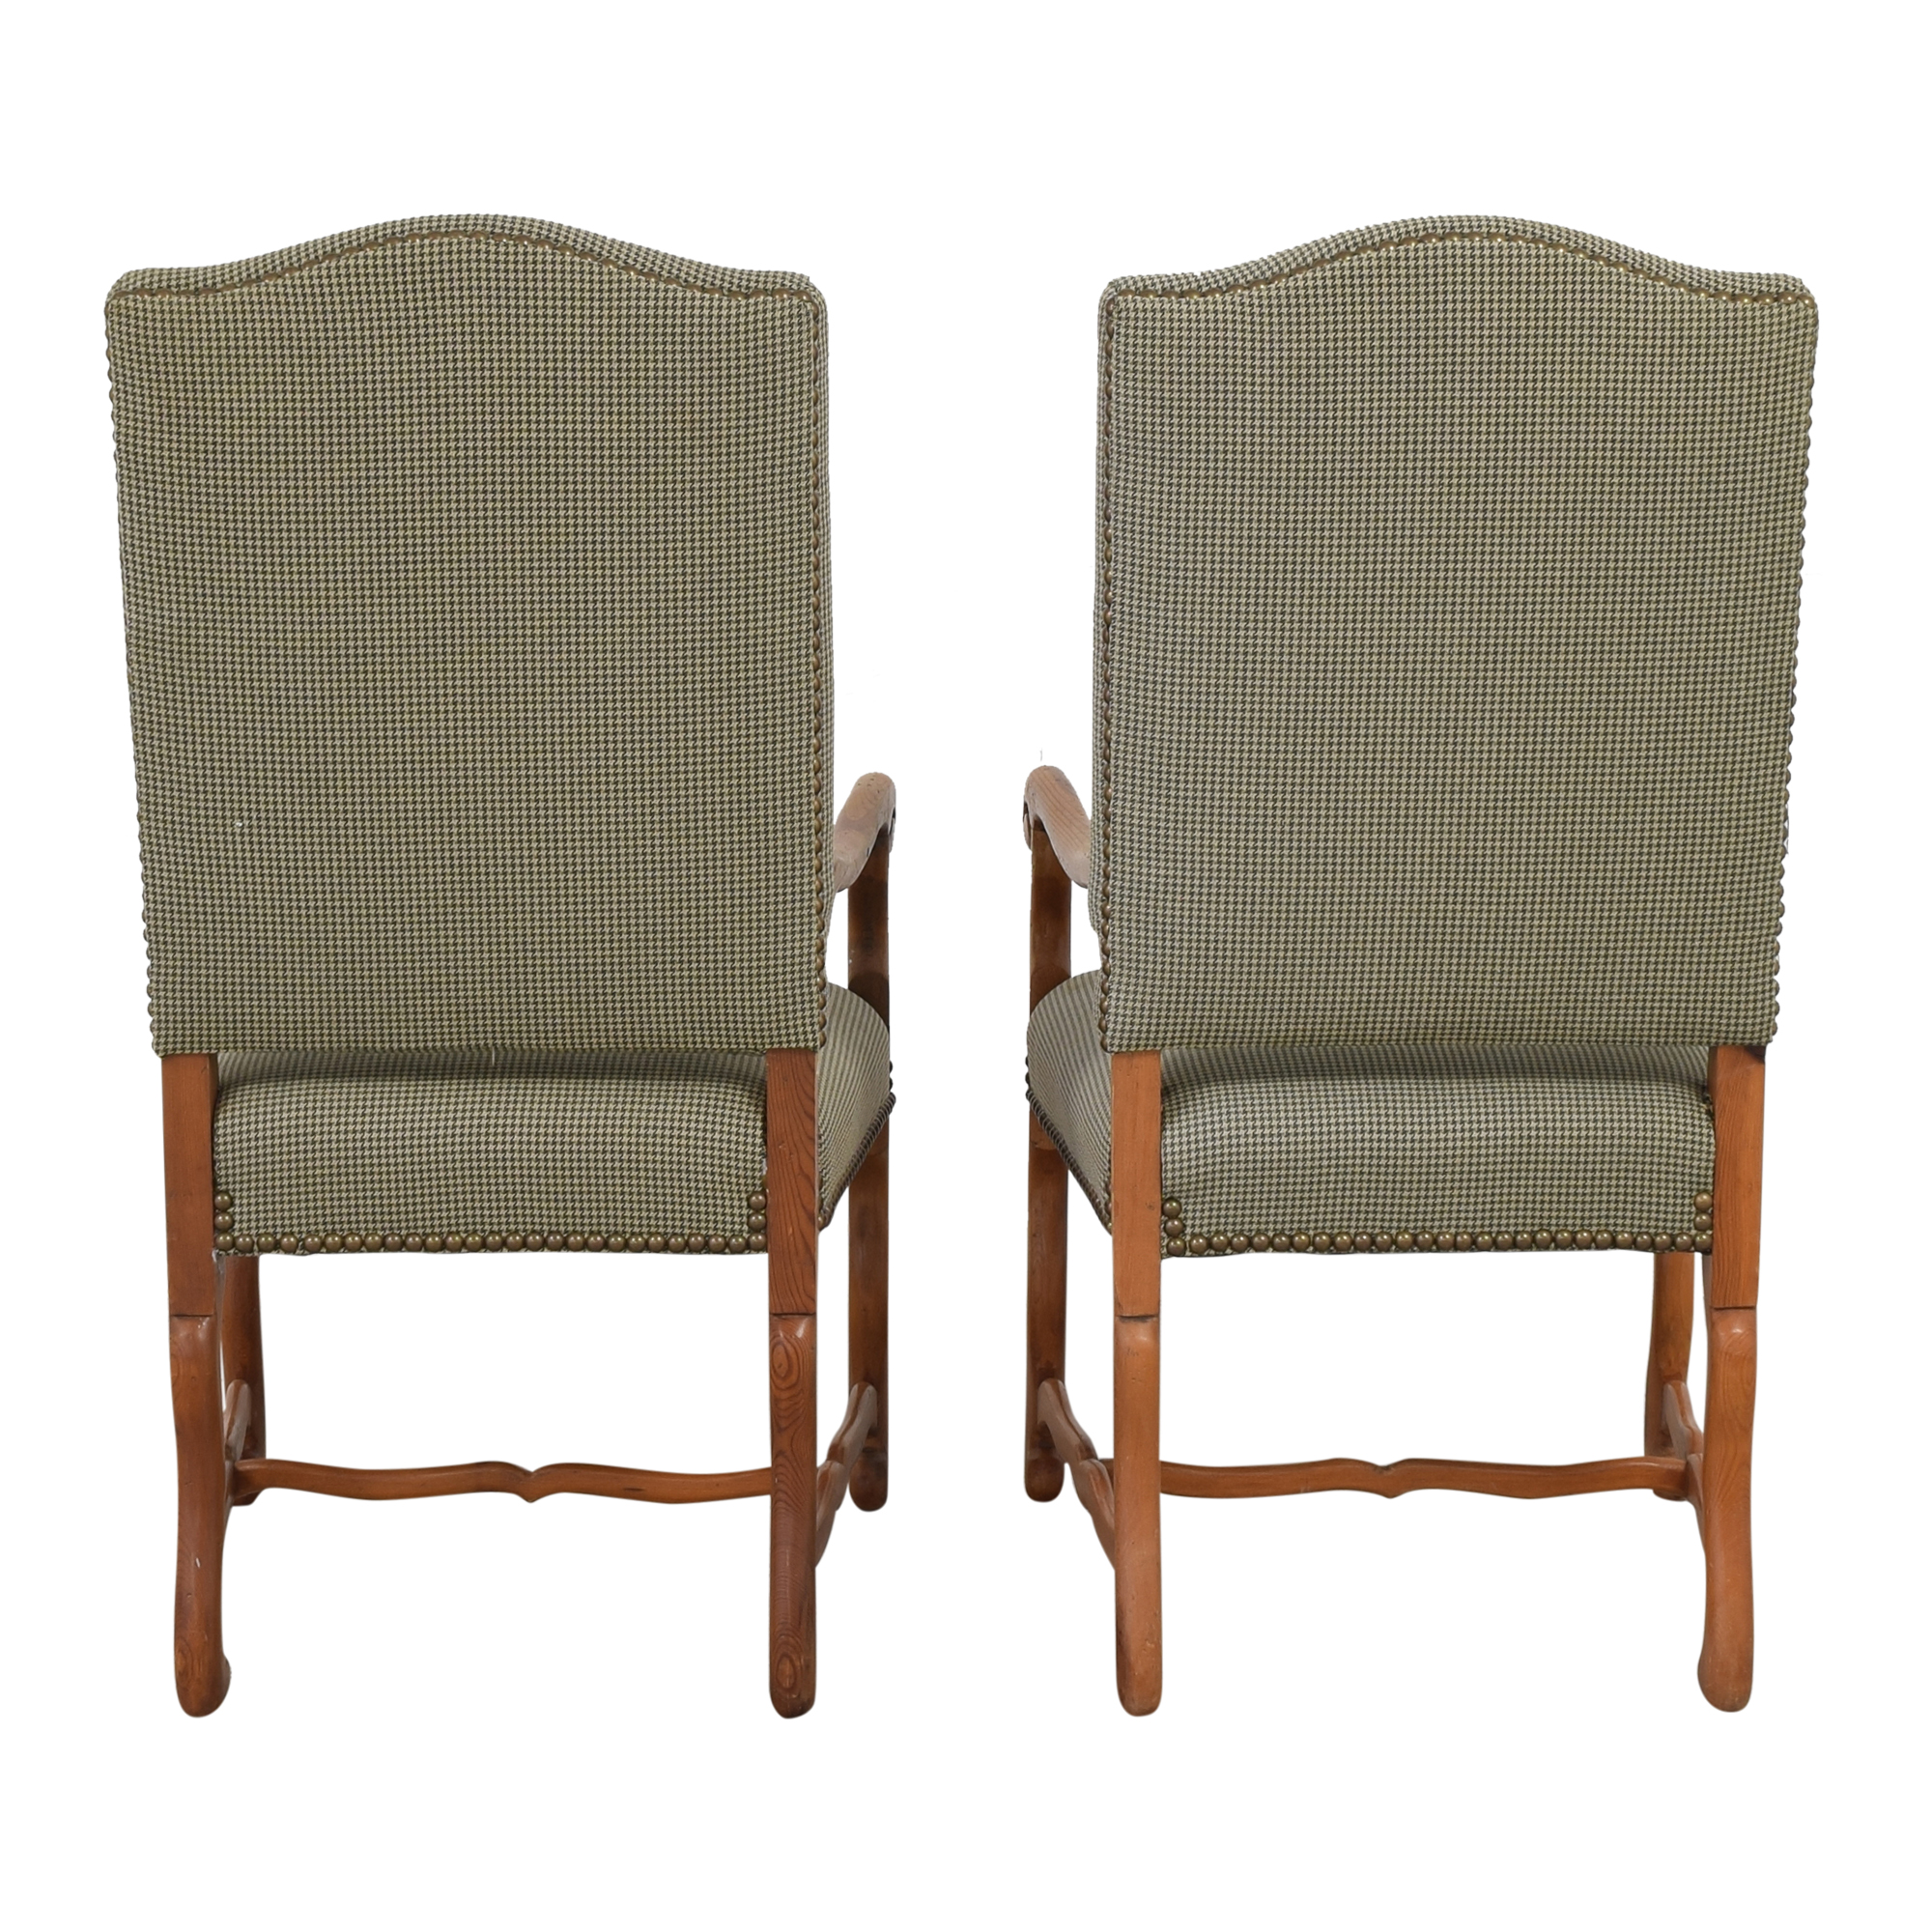 Ralph Lauren Home Ralph Lauren Home Os De Mouton Style Arm Chairs  Dining Chairs